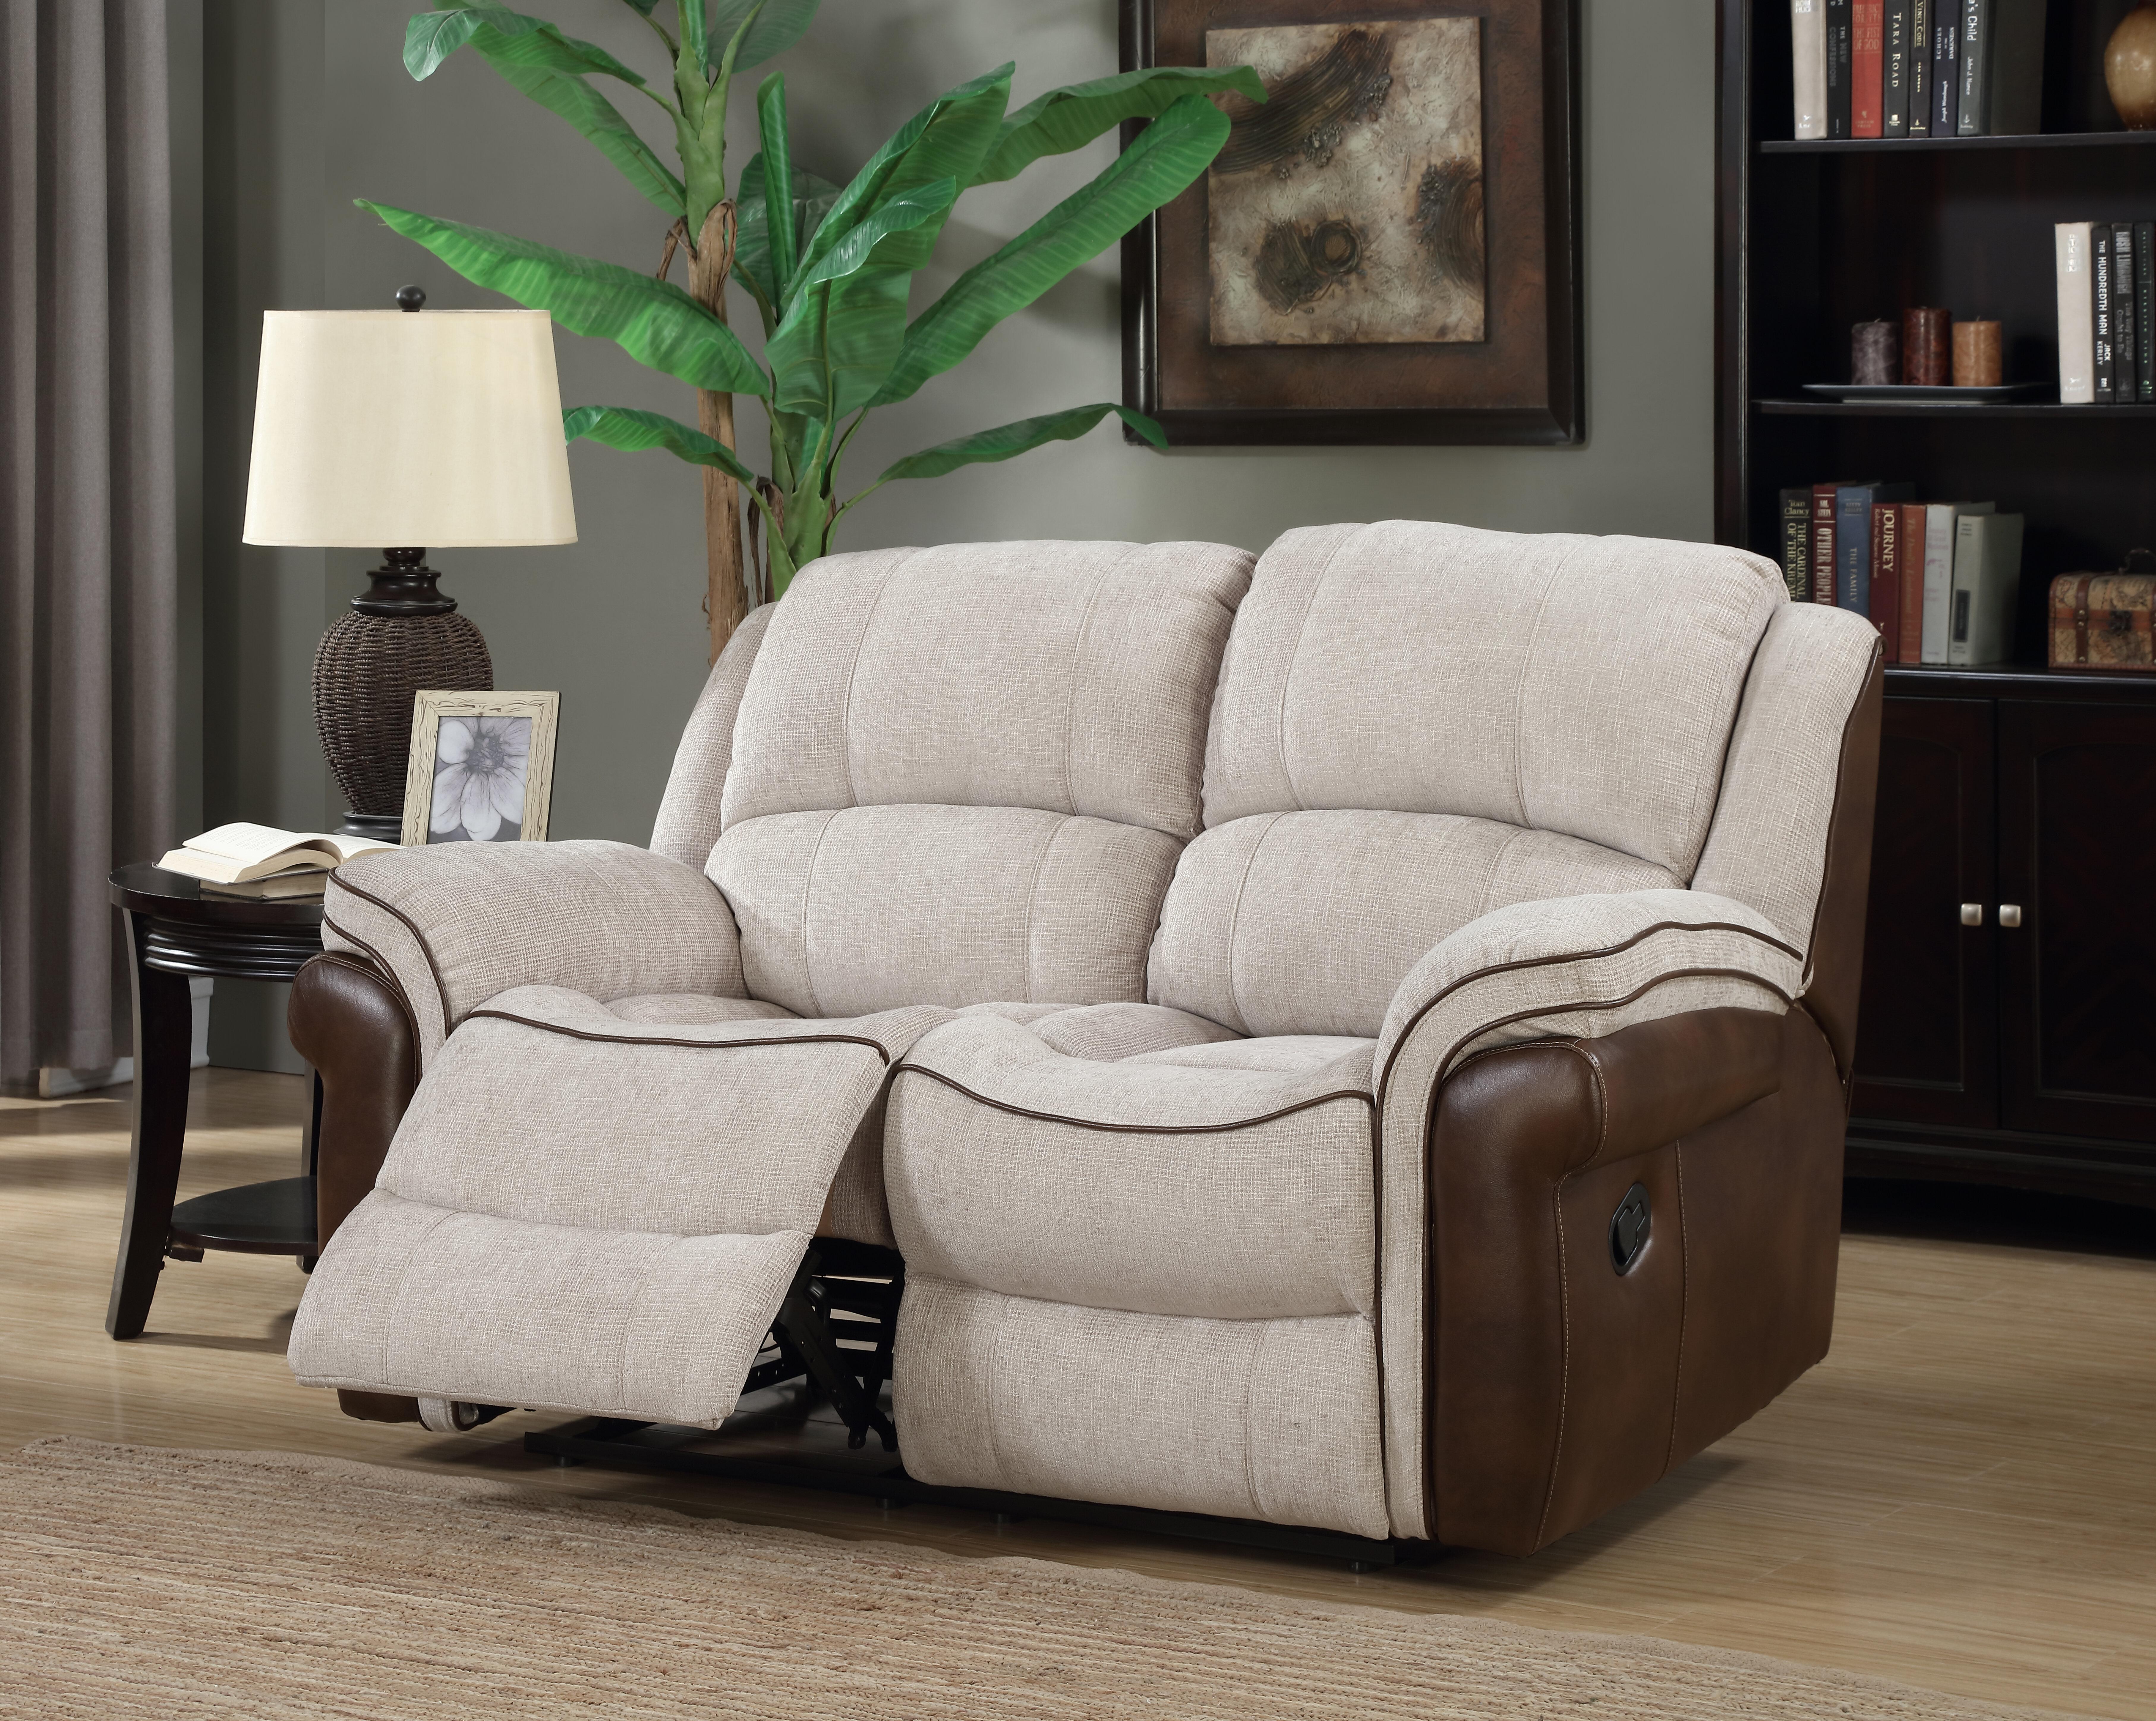 Three Posts Storrs 2 Seater Reclining Sofa & Reviews   Wayfair.co.uk